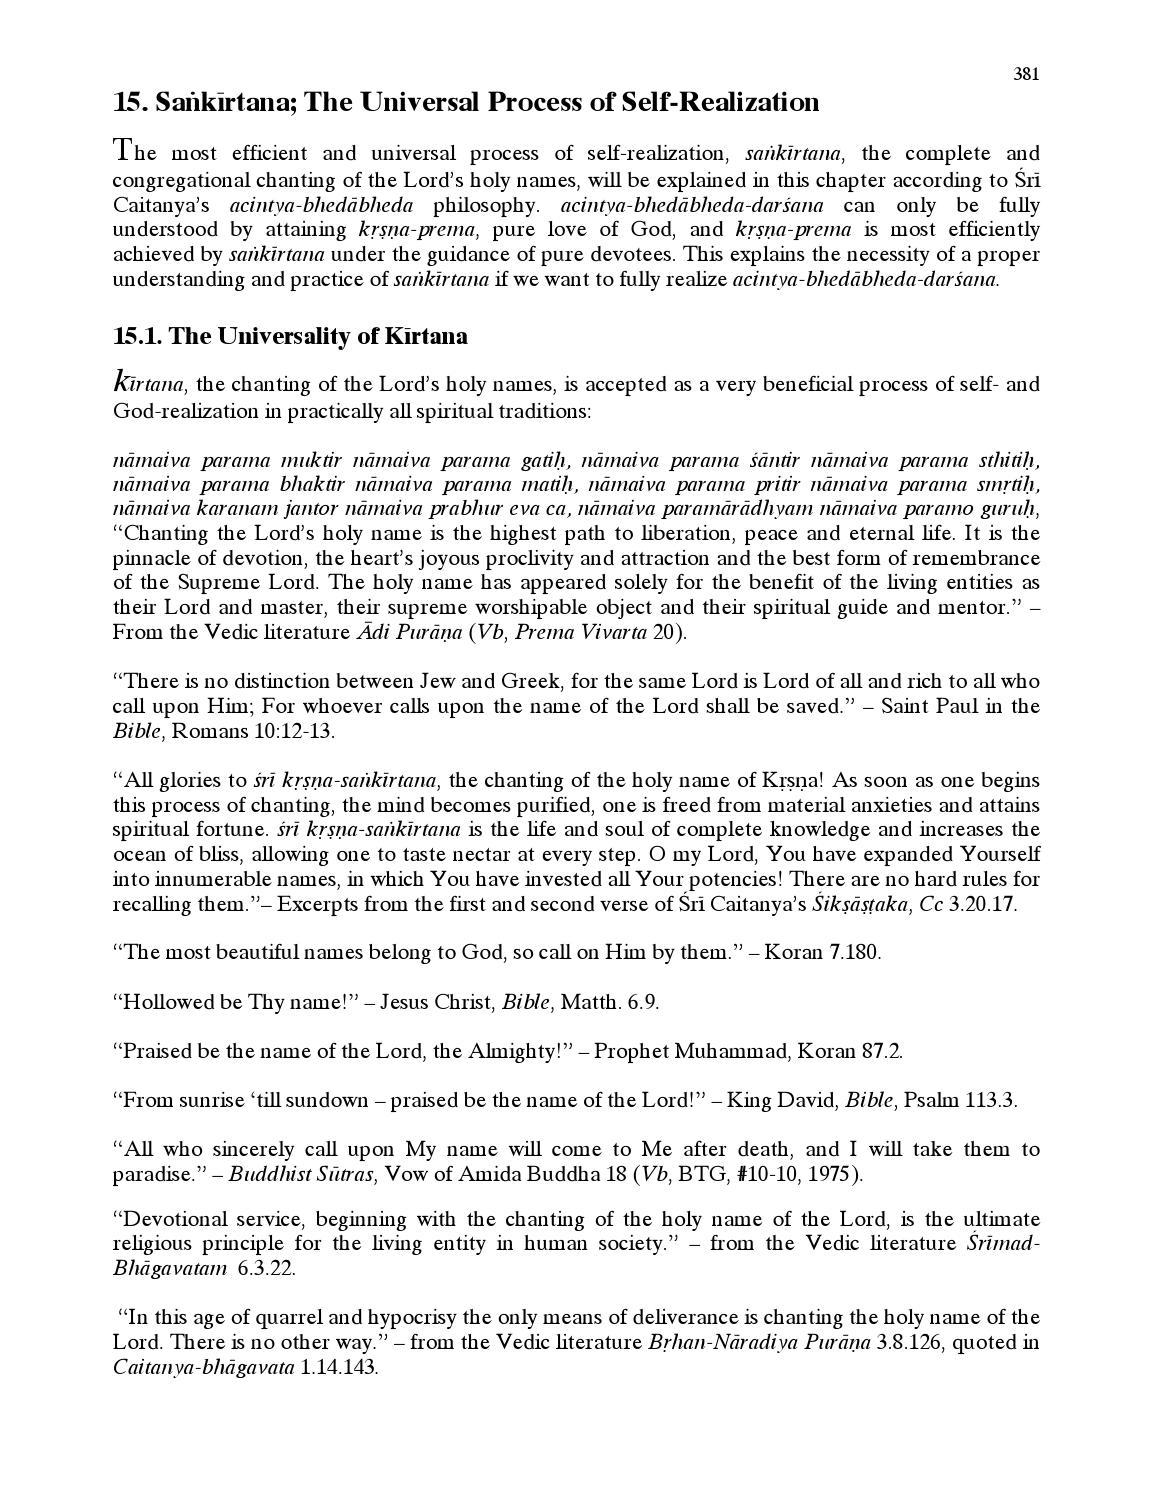 Unity in Diversity by World Vaishnava Association - issuu